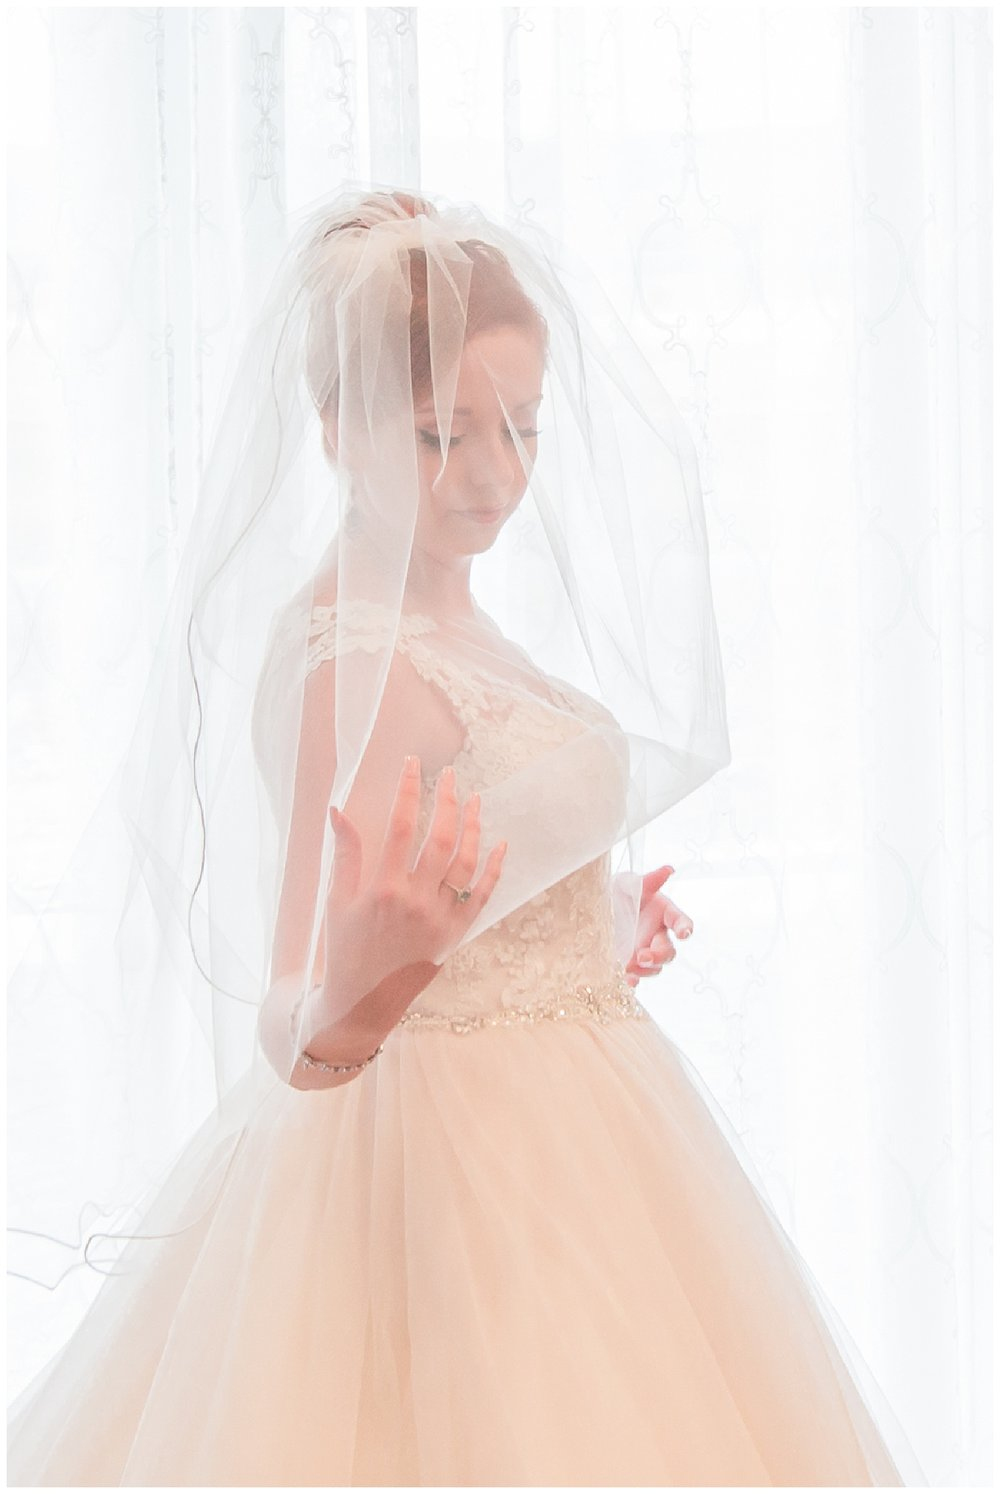 lynchburg_wedding_photographer_the_columns_at_six_penny_farm_0051.jpg